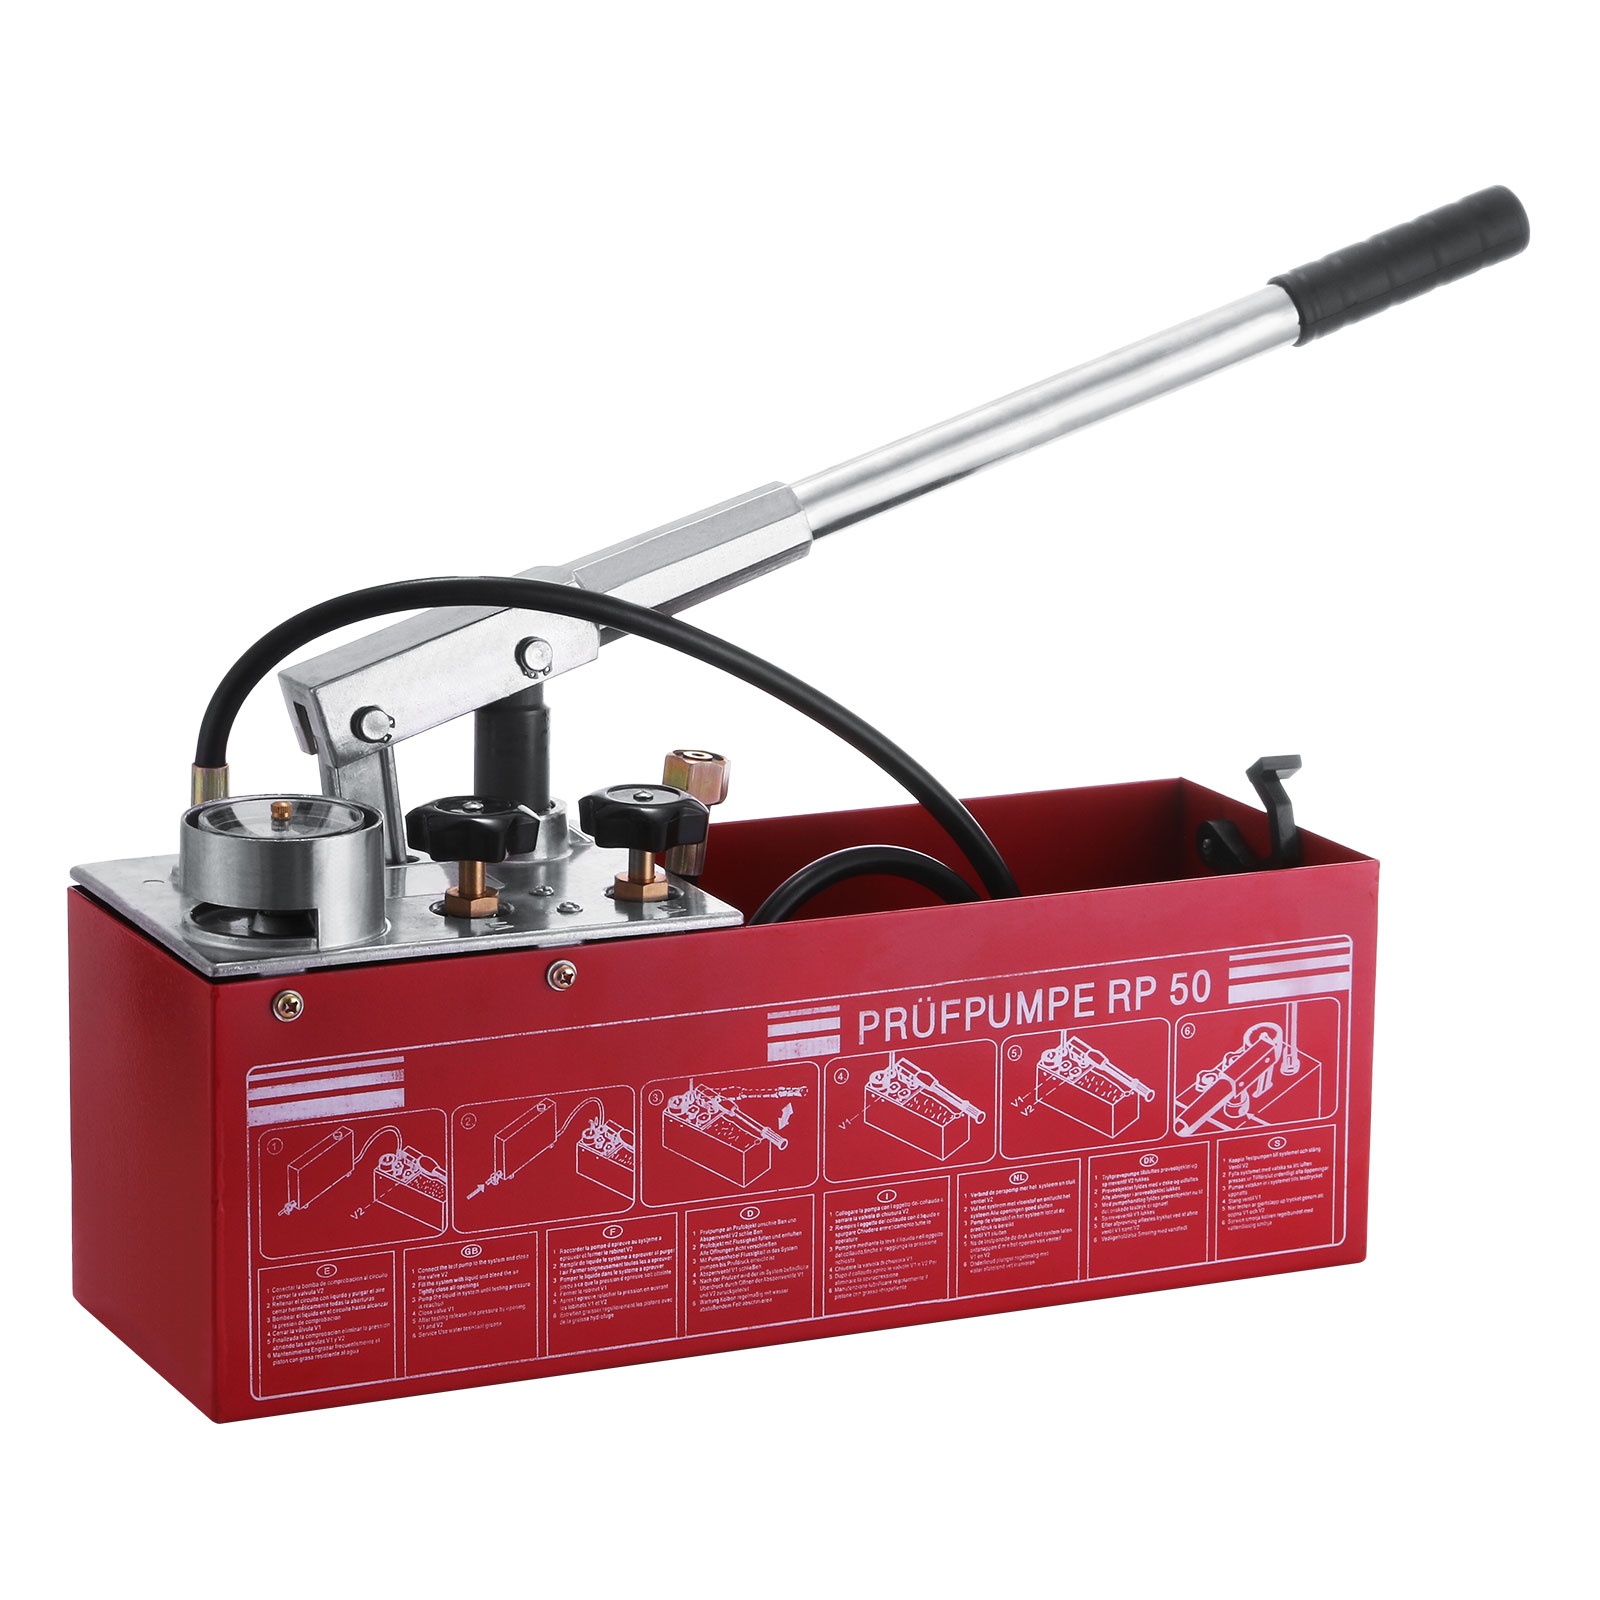 VEVOR Test Pump 50 Bar 726 PSI Manual Test Pump 3 Gallon ...